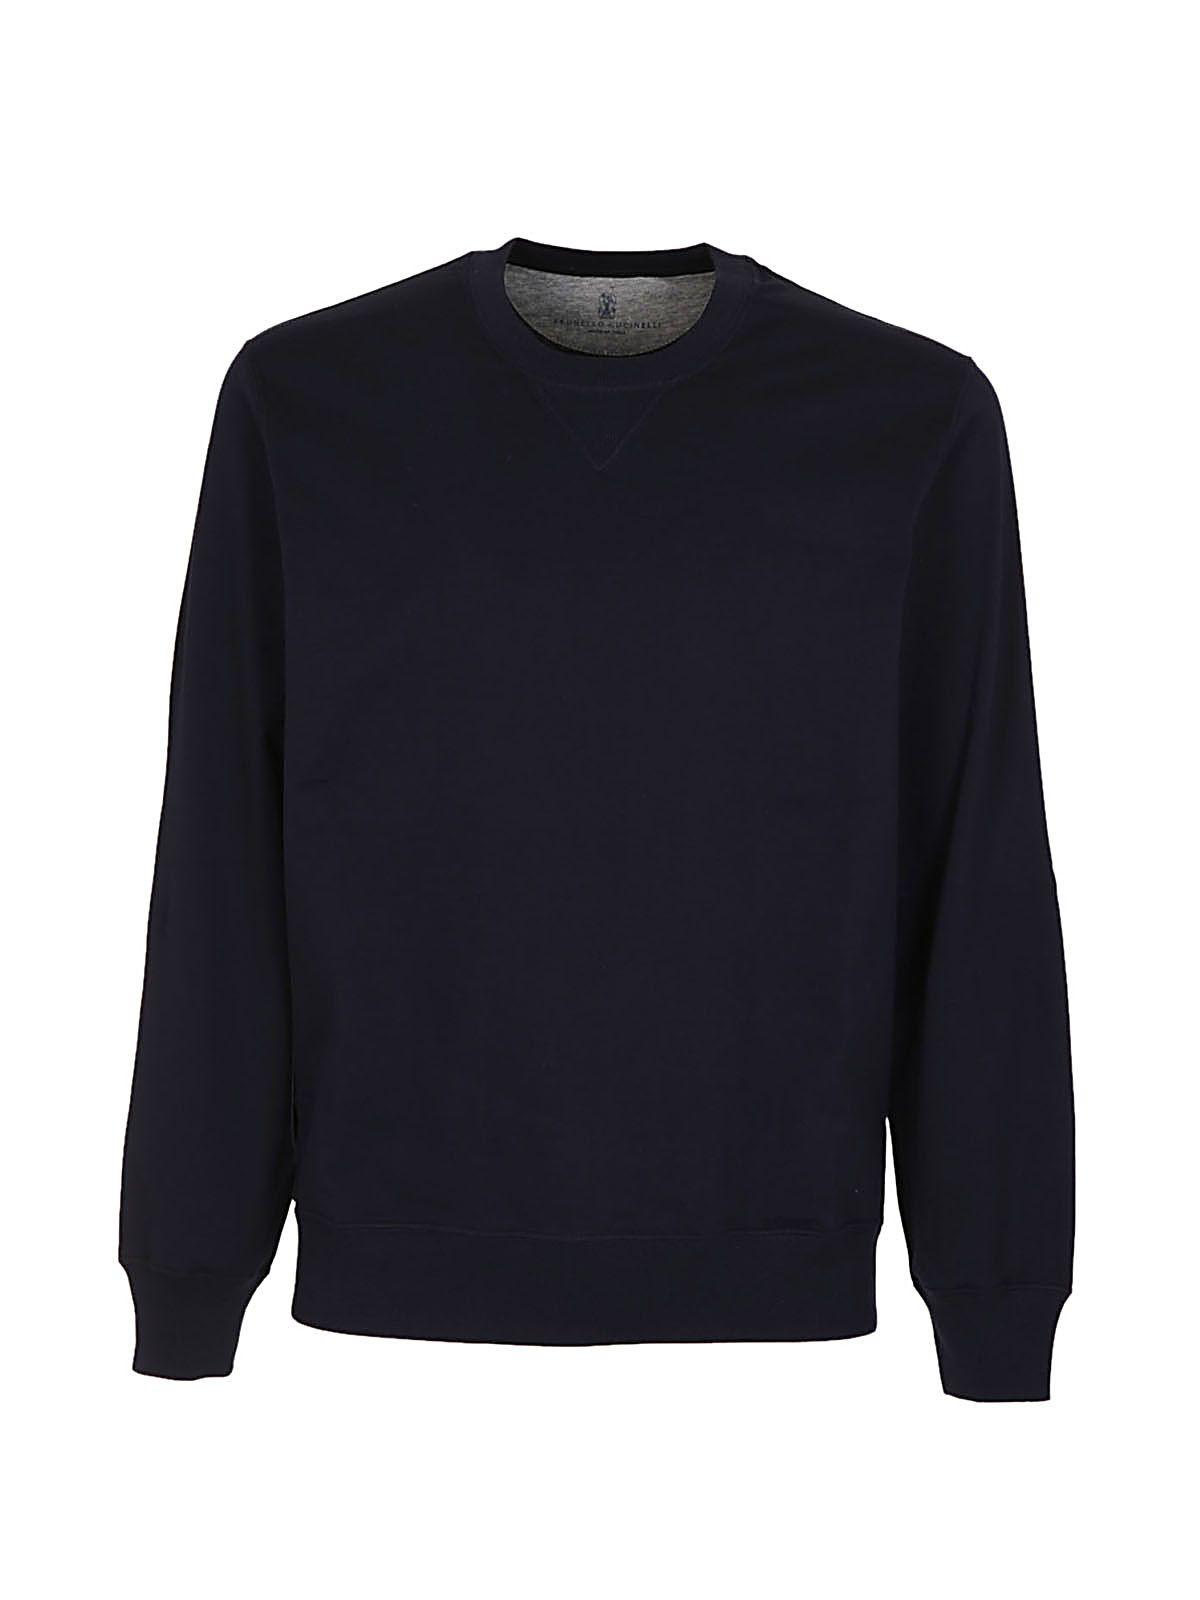 Brunello Cucinelli Classic Sweatshirt